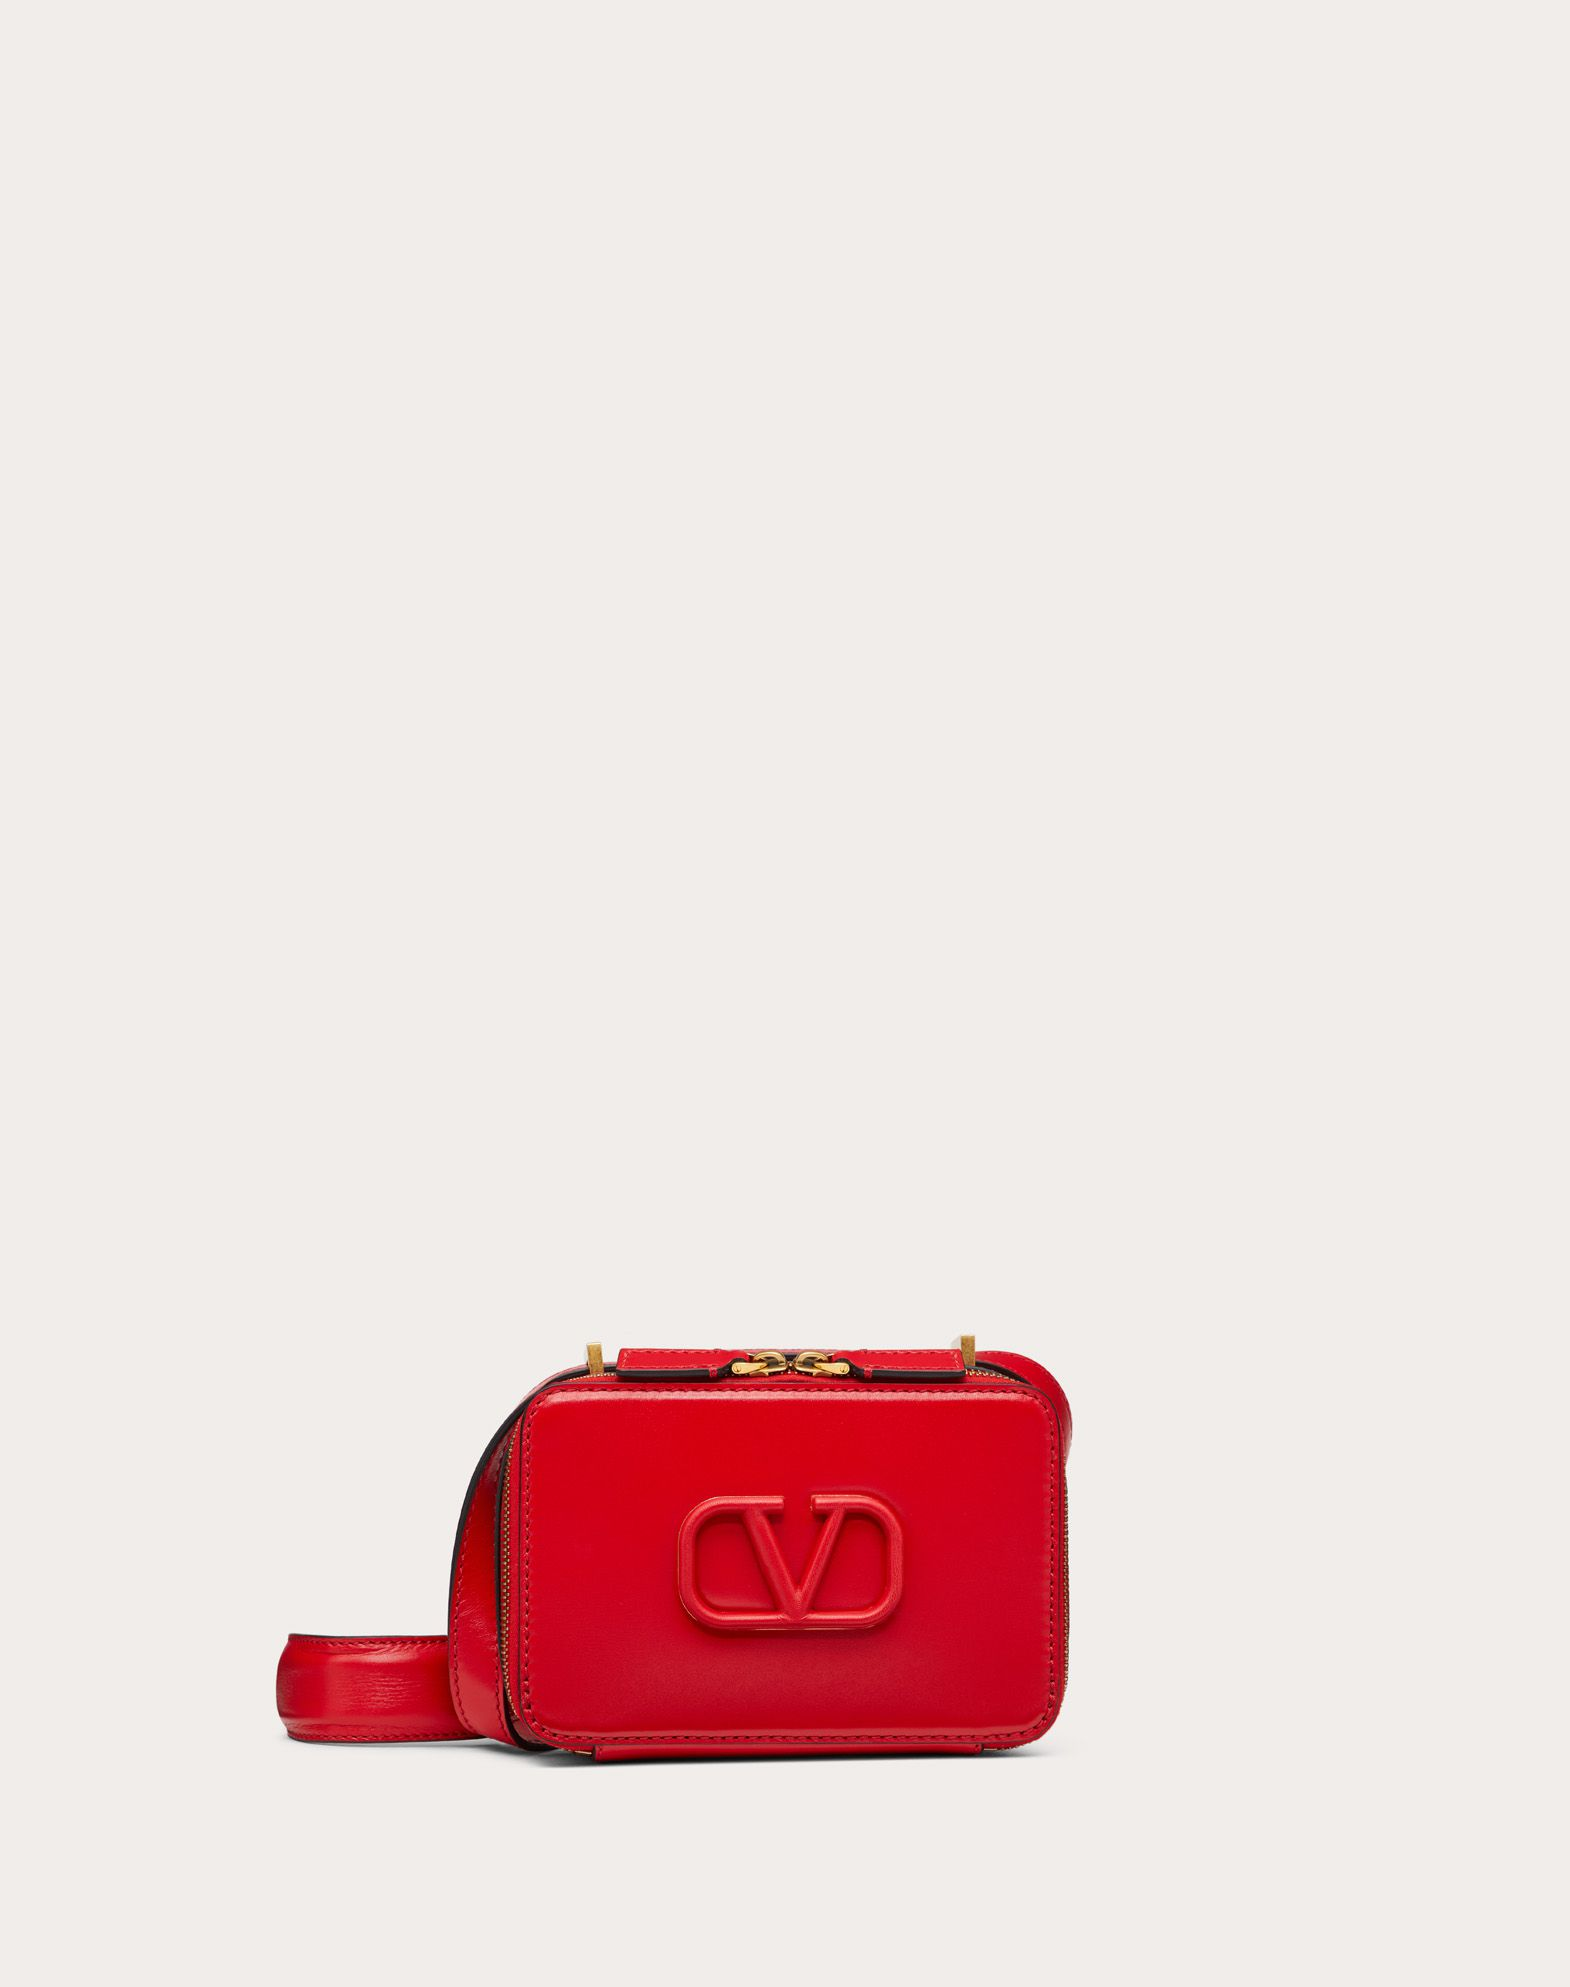 VSLING Smooth Calfskin Crossbody Bag